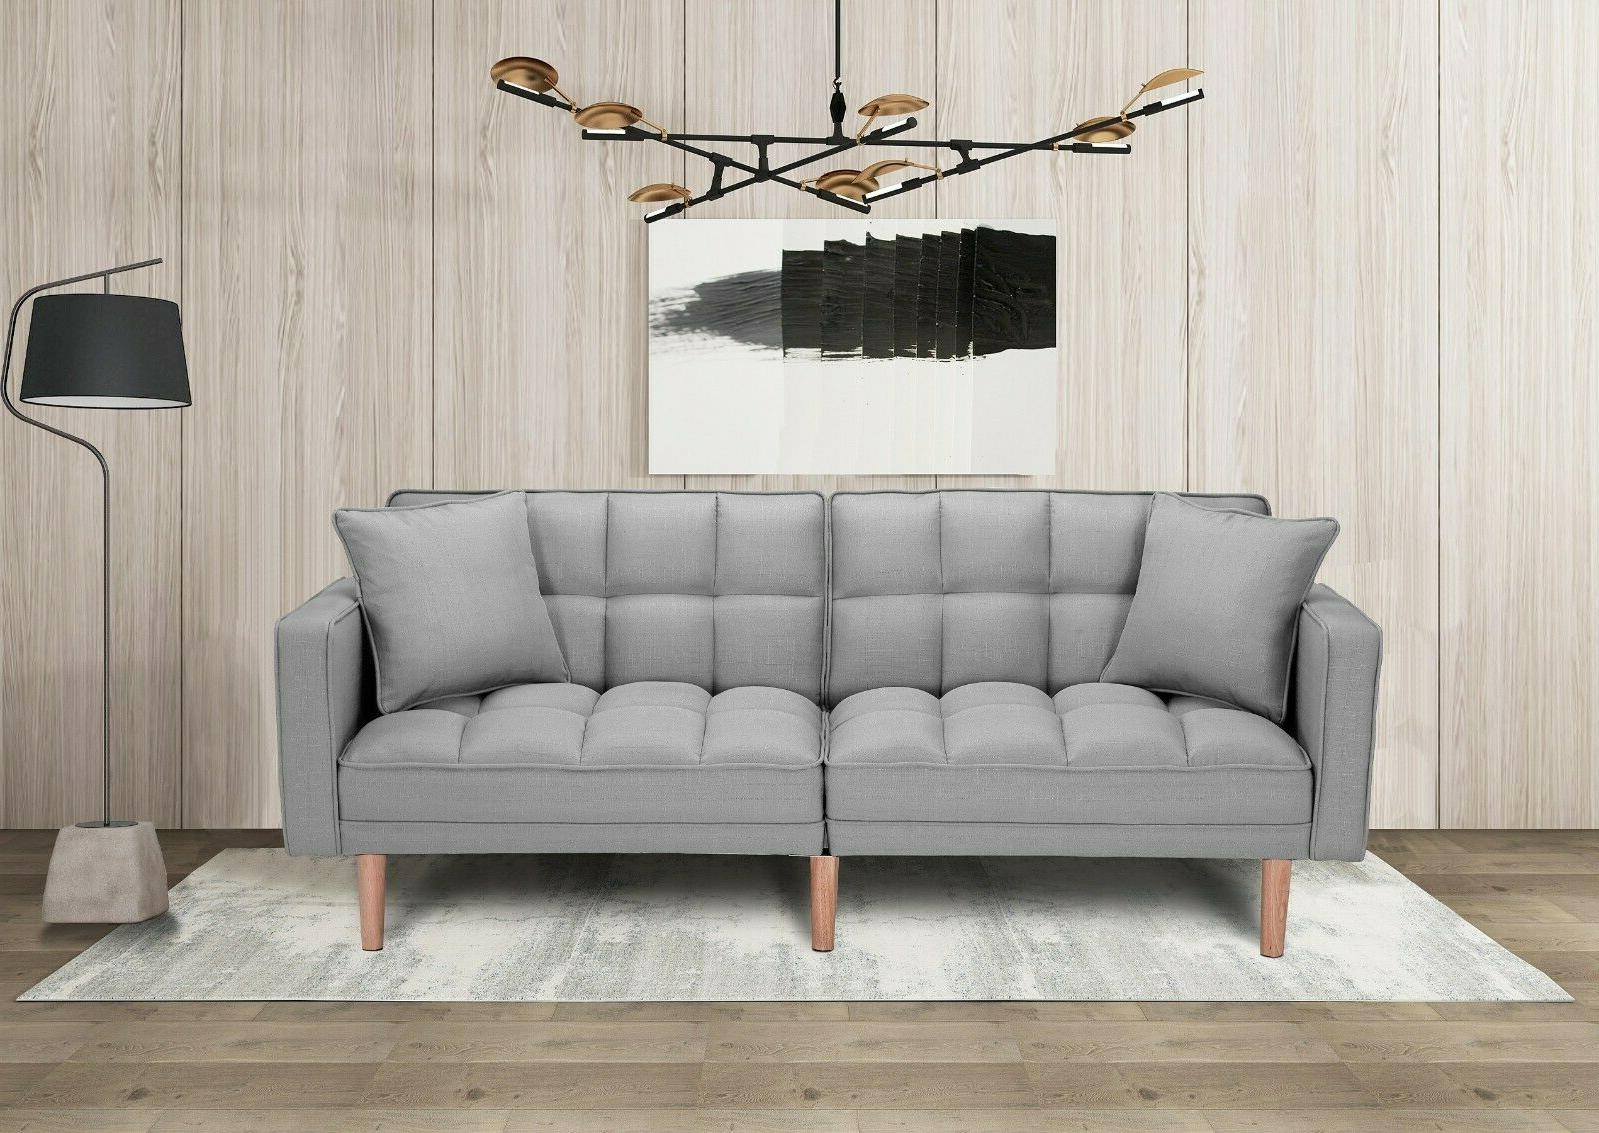 Futon Sofa Bed Reclining Back Sofa Sleeper Folding Lounge Co